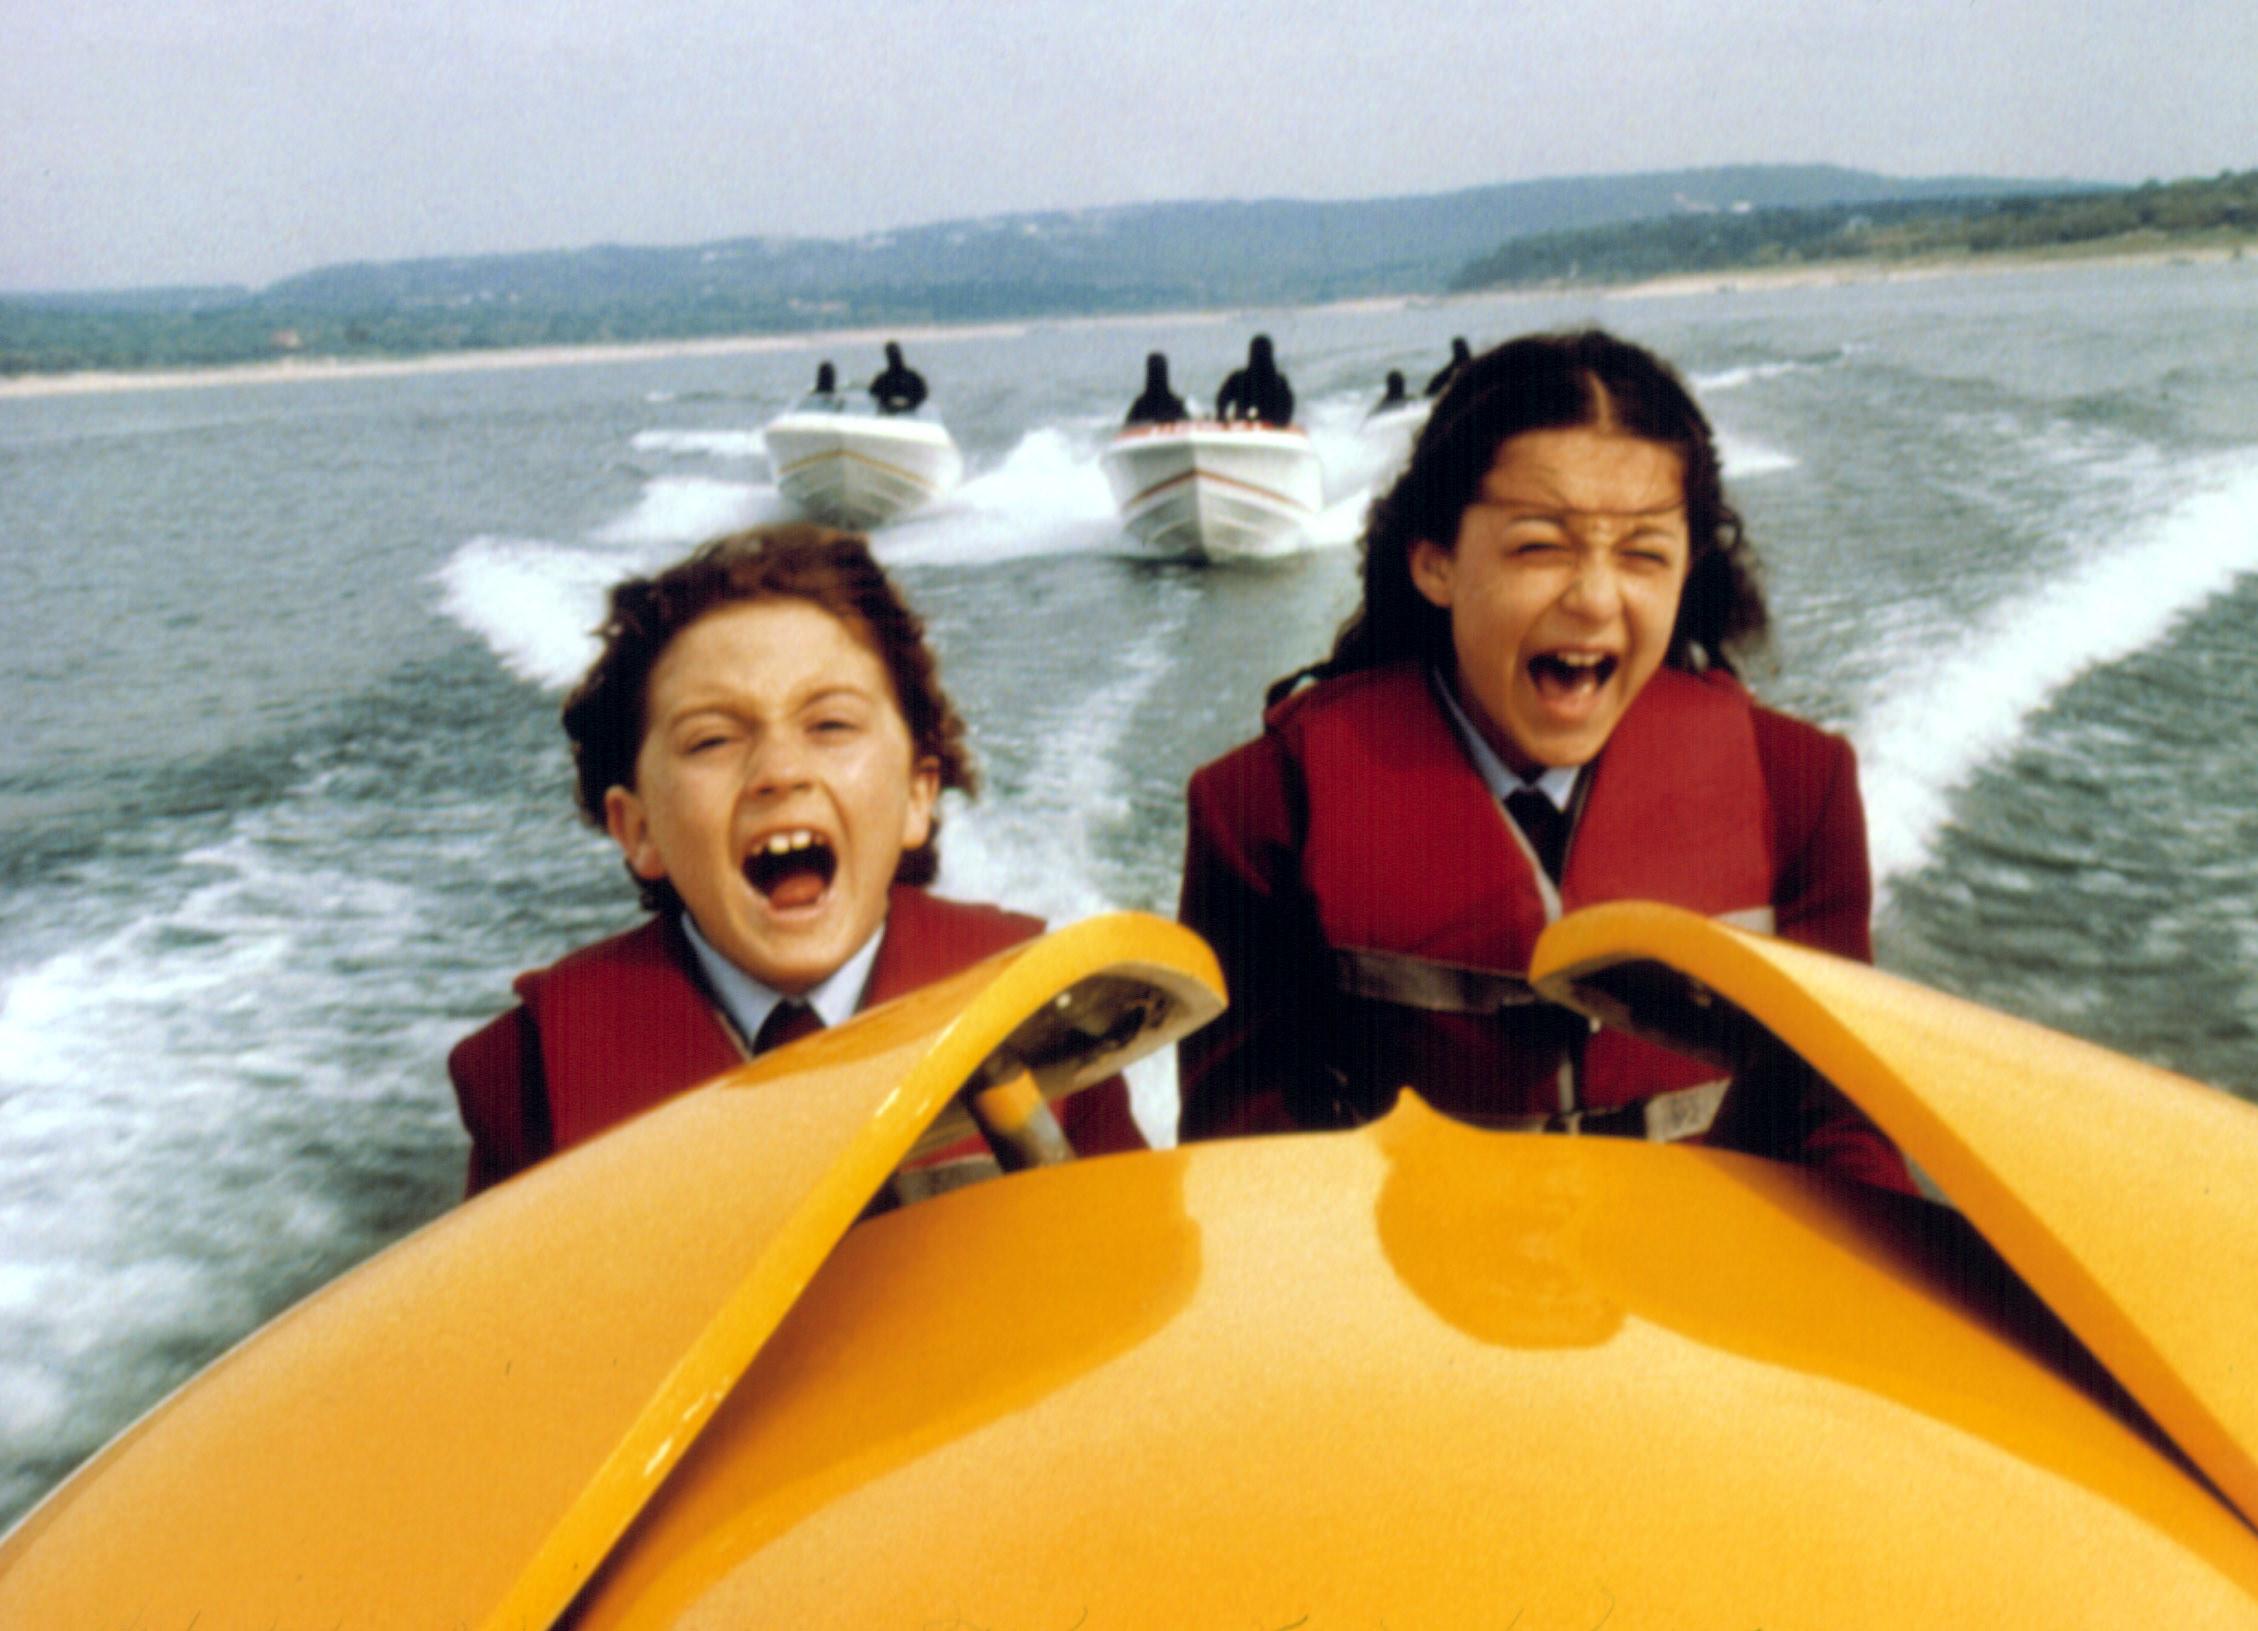 Daryl Sabara and Alexa Vega screaming on a boat.